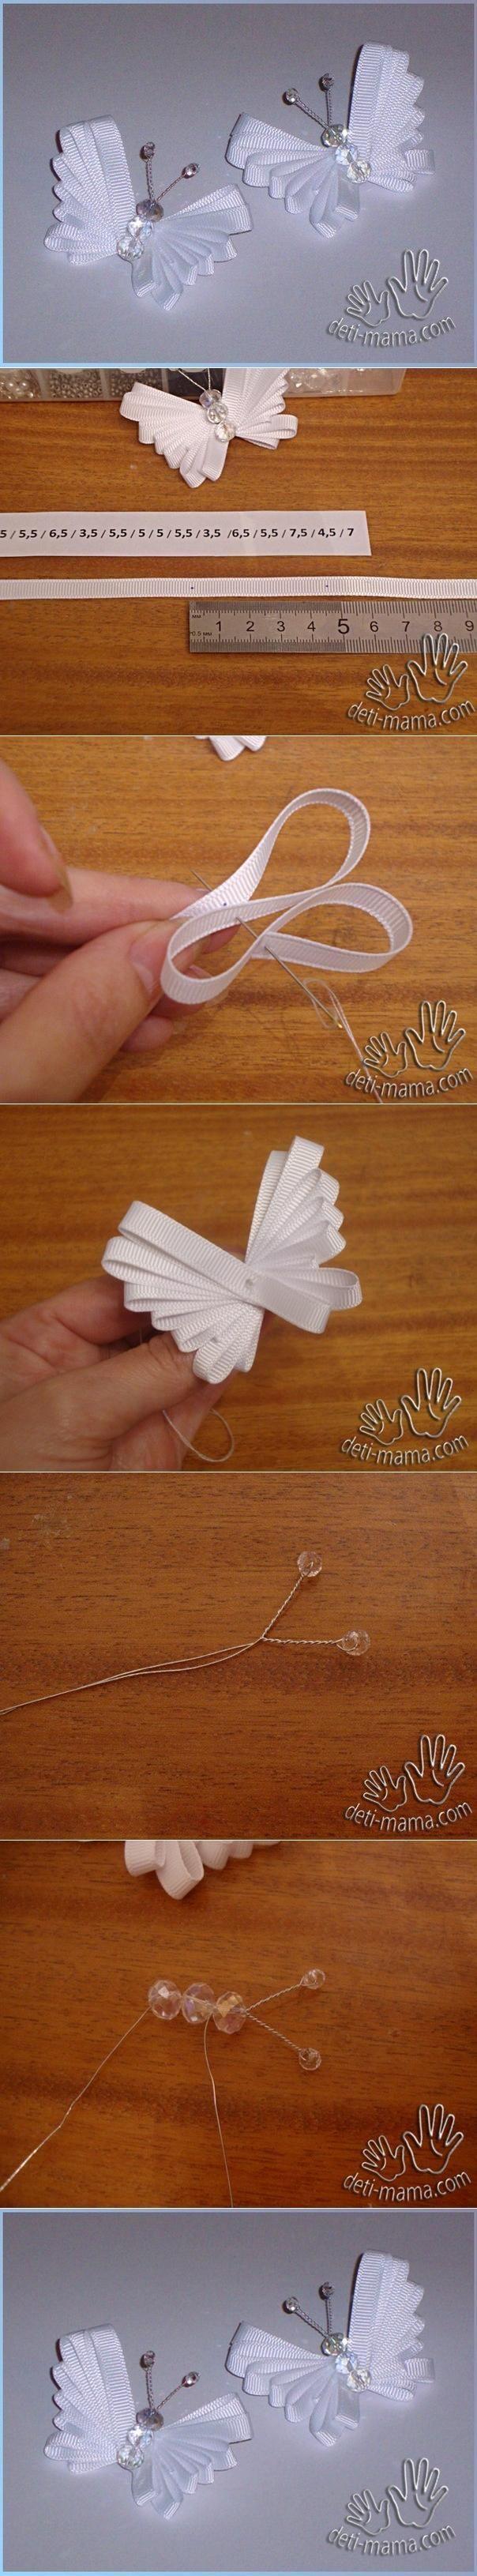 DIY Ribbon Crafts : DIY Easy Ribbon Butterfly